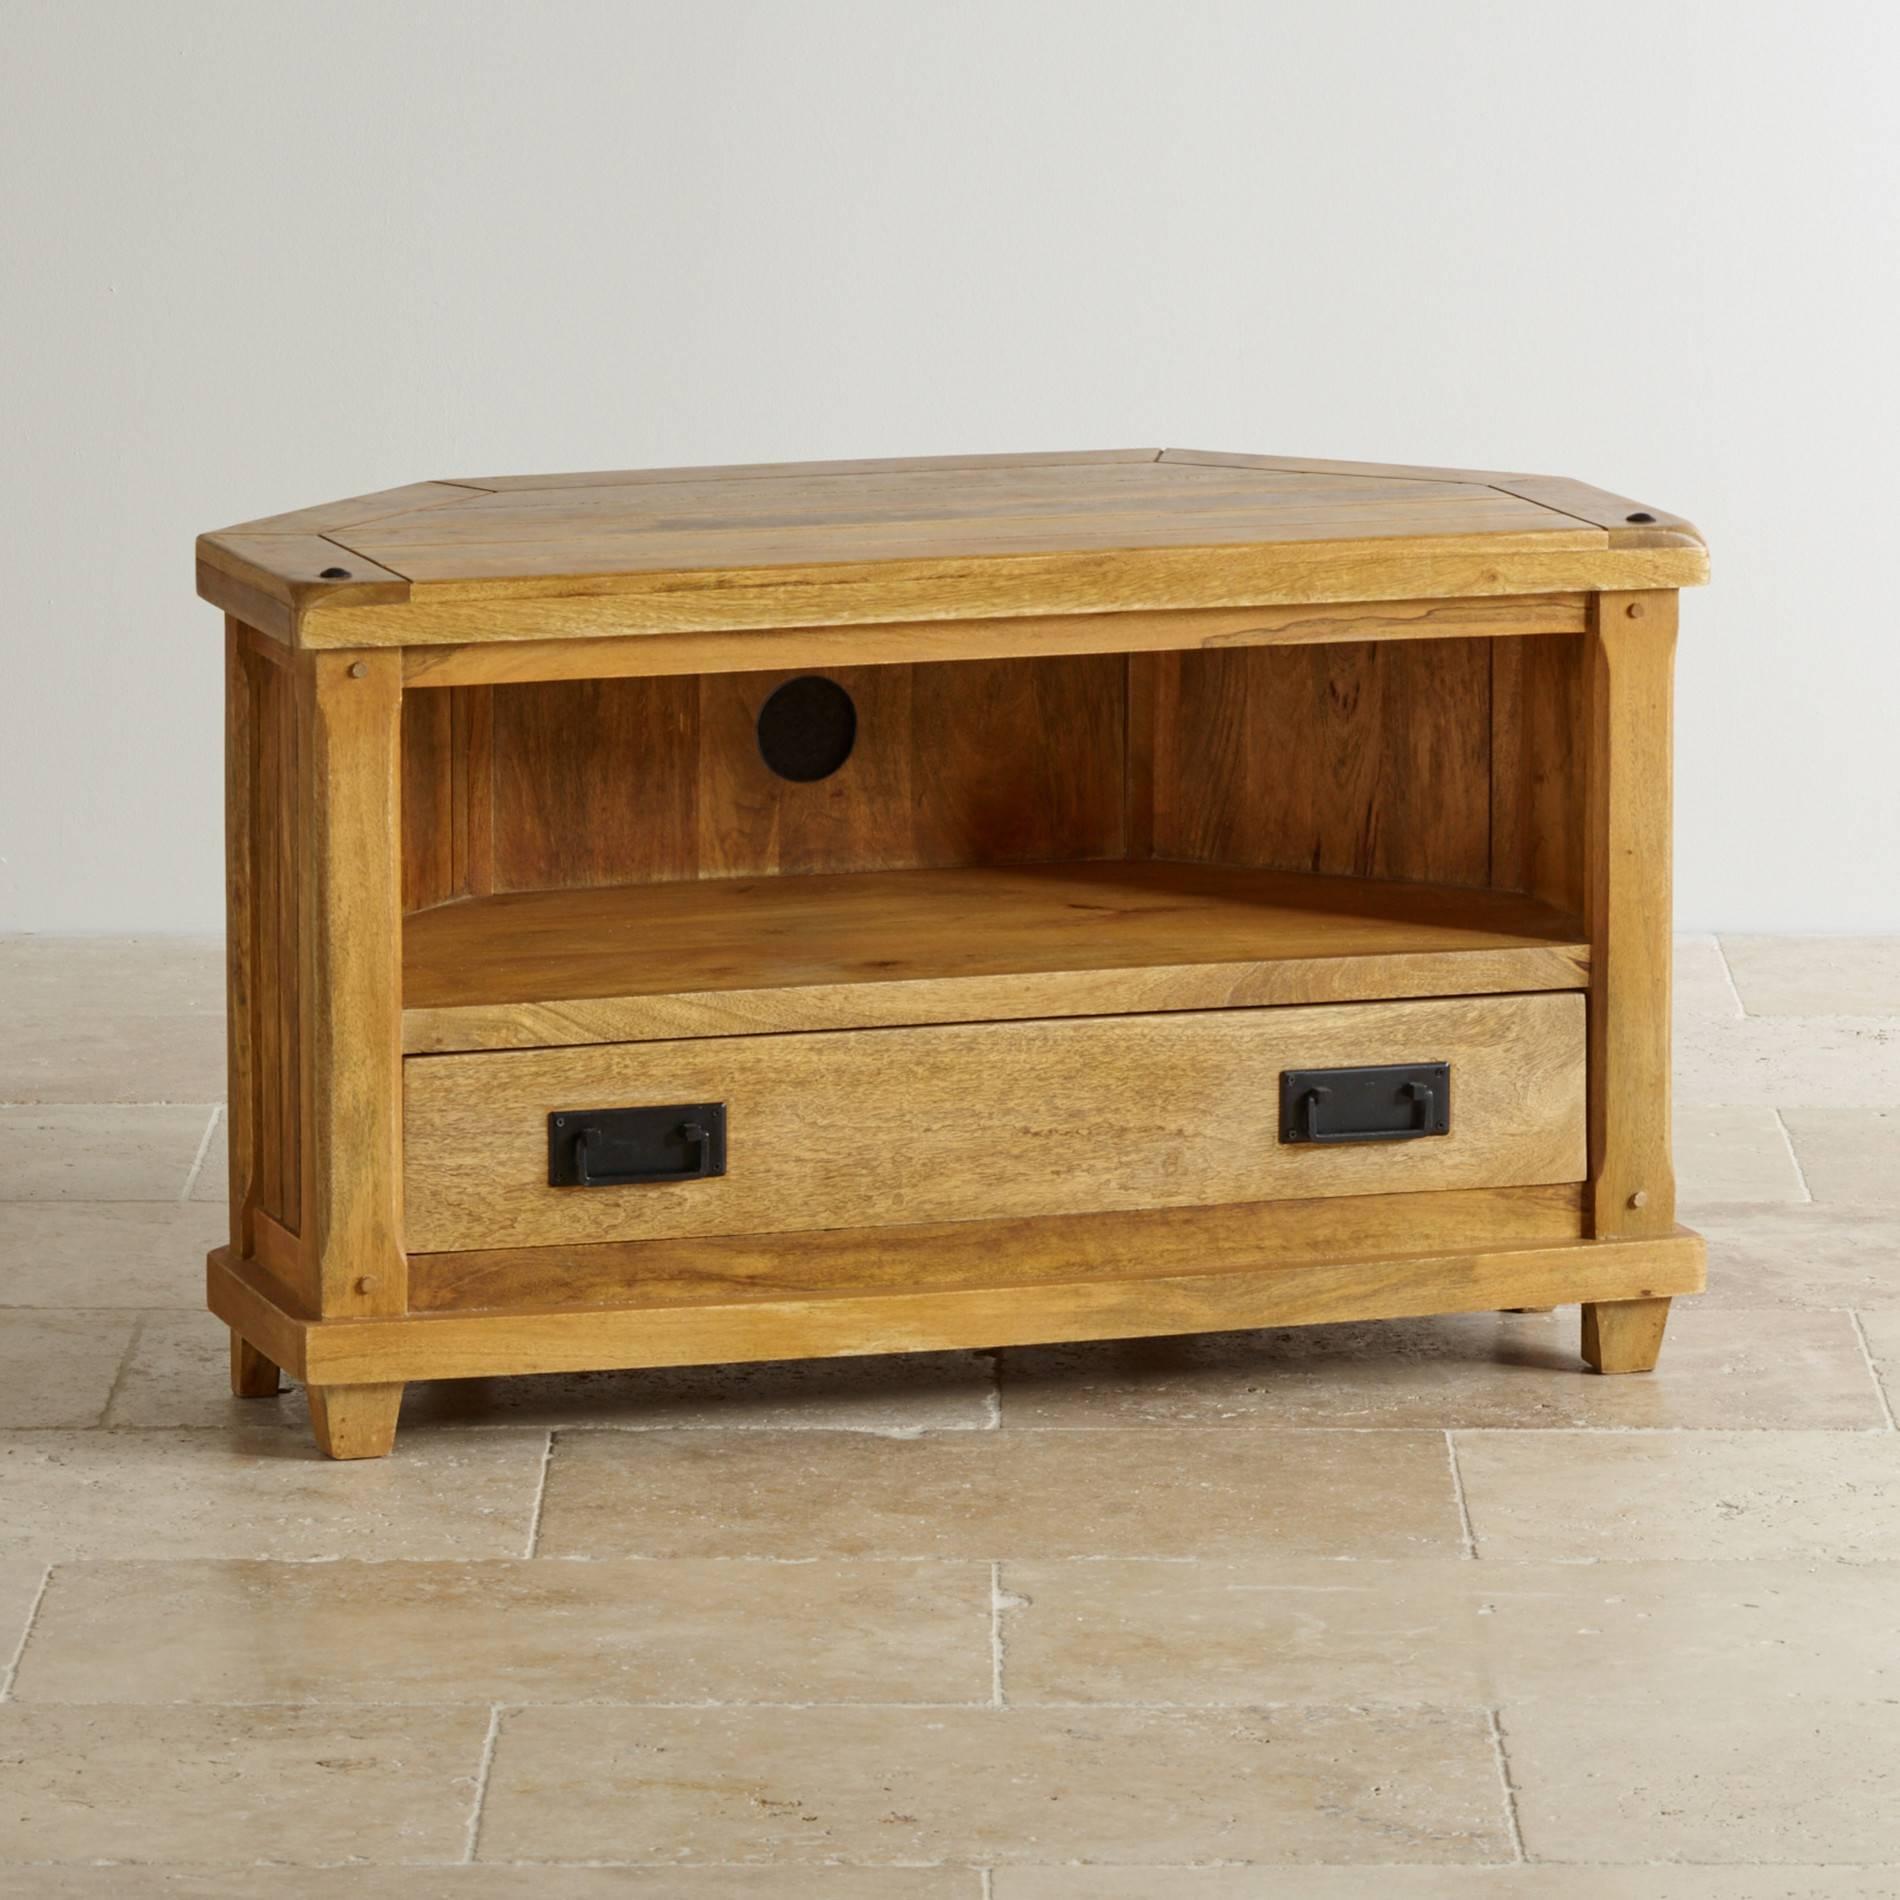 Baku Light Corner Tv Cabinet In Natural Solid Mango intended for Mango Wood Tv Cabinets (Image 3 of 15)